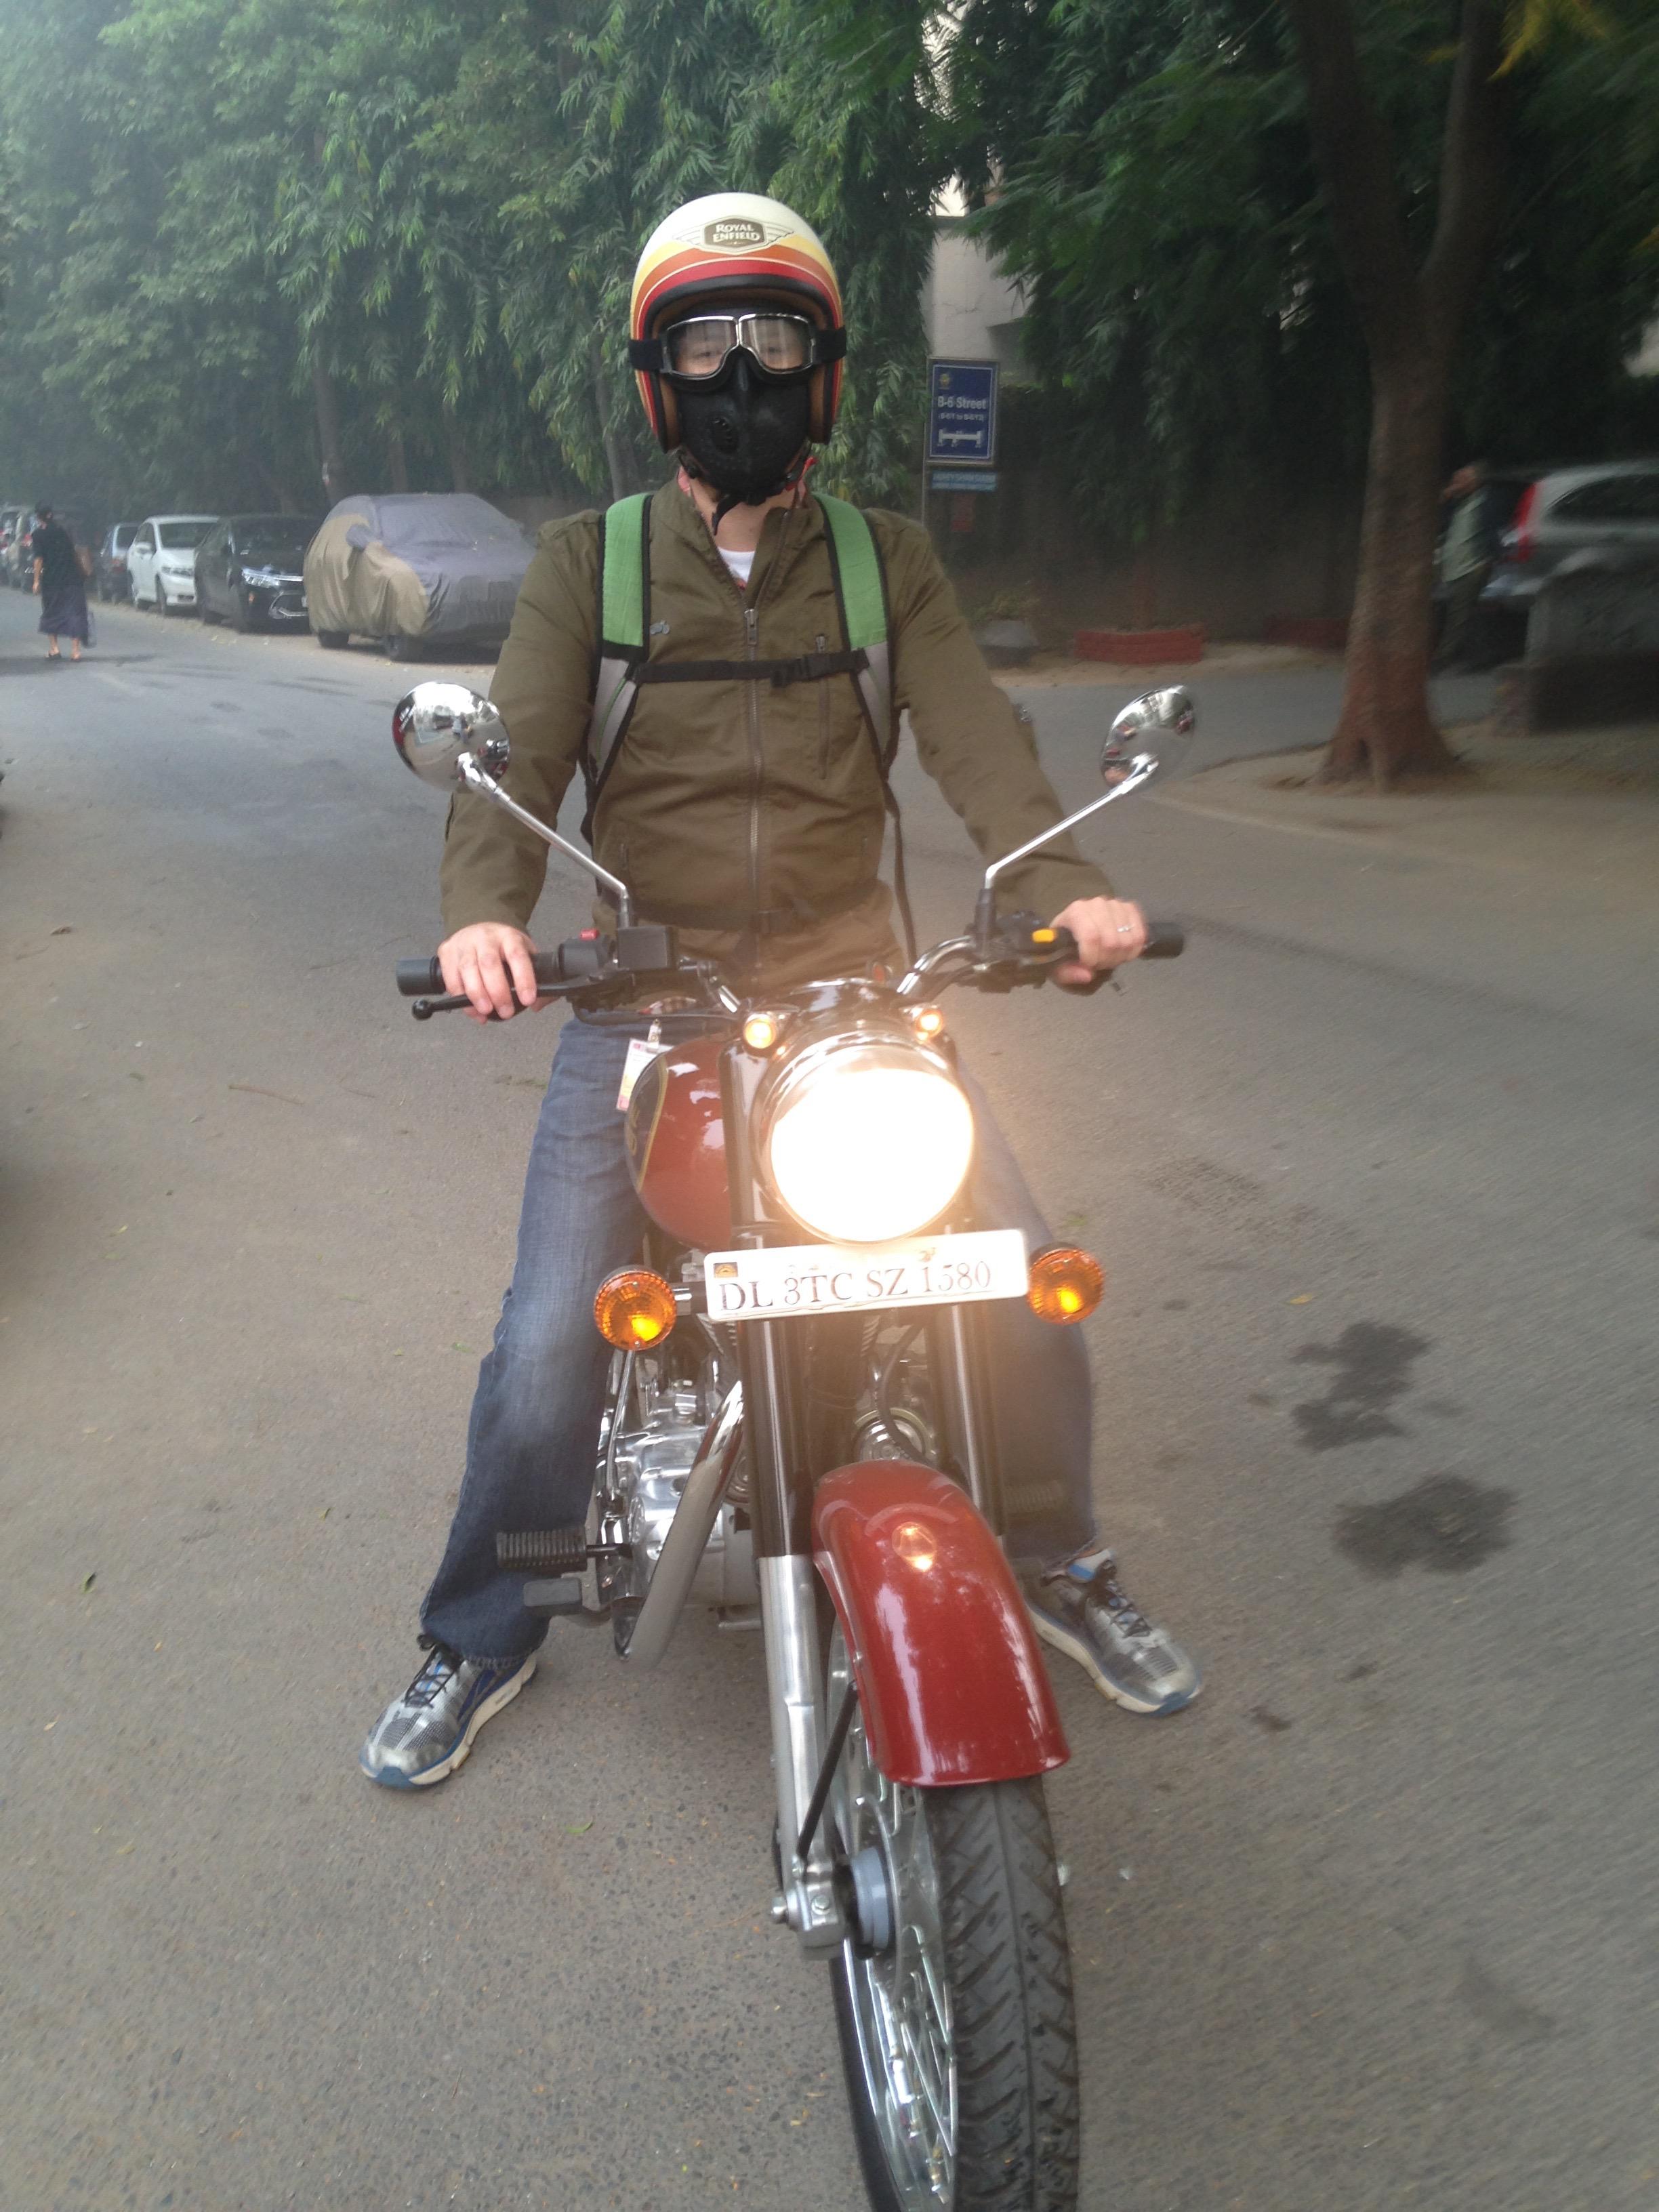 You take your car to work, I'll take my bike. (Delhi, India; Oct 2017)